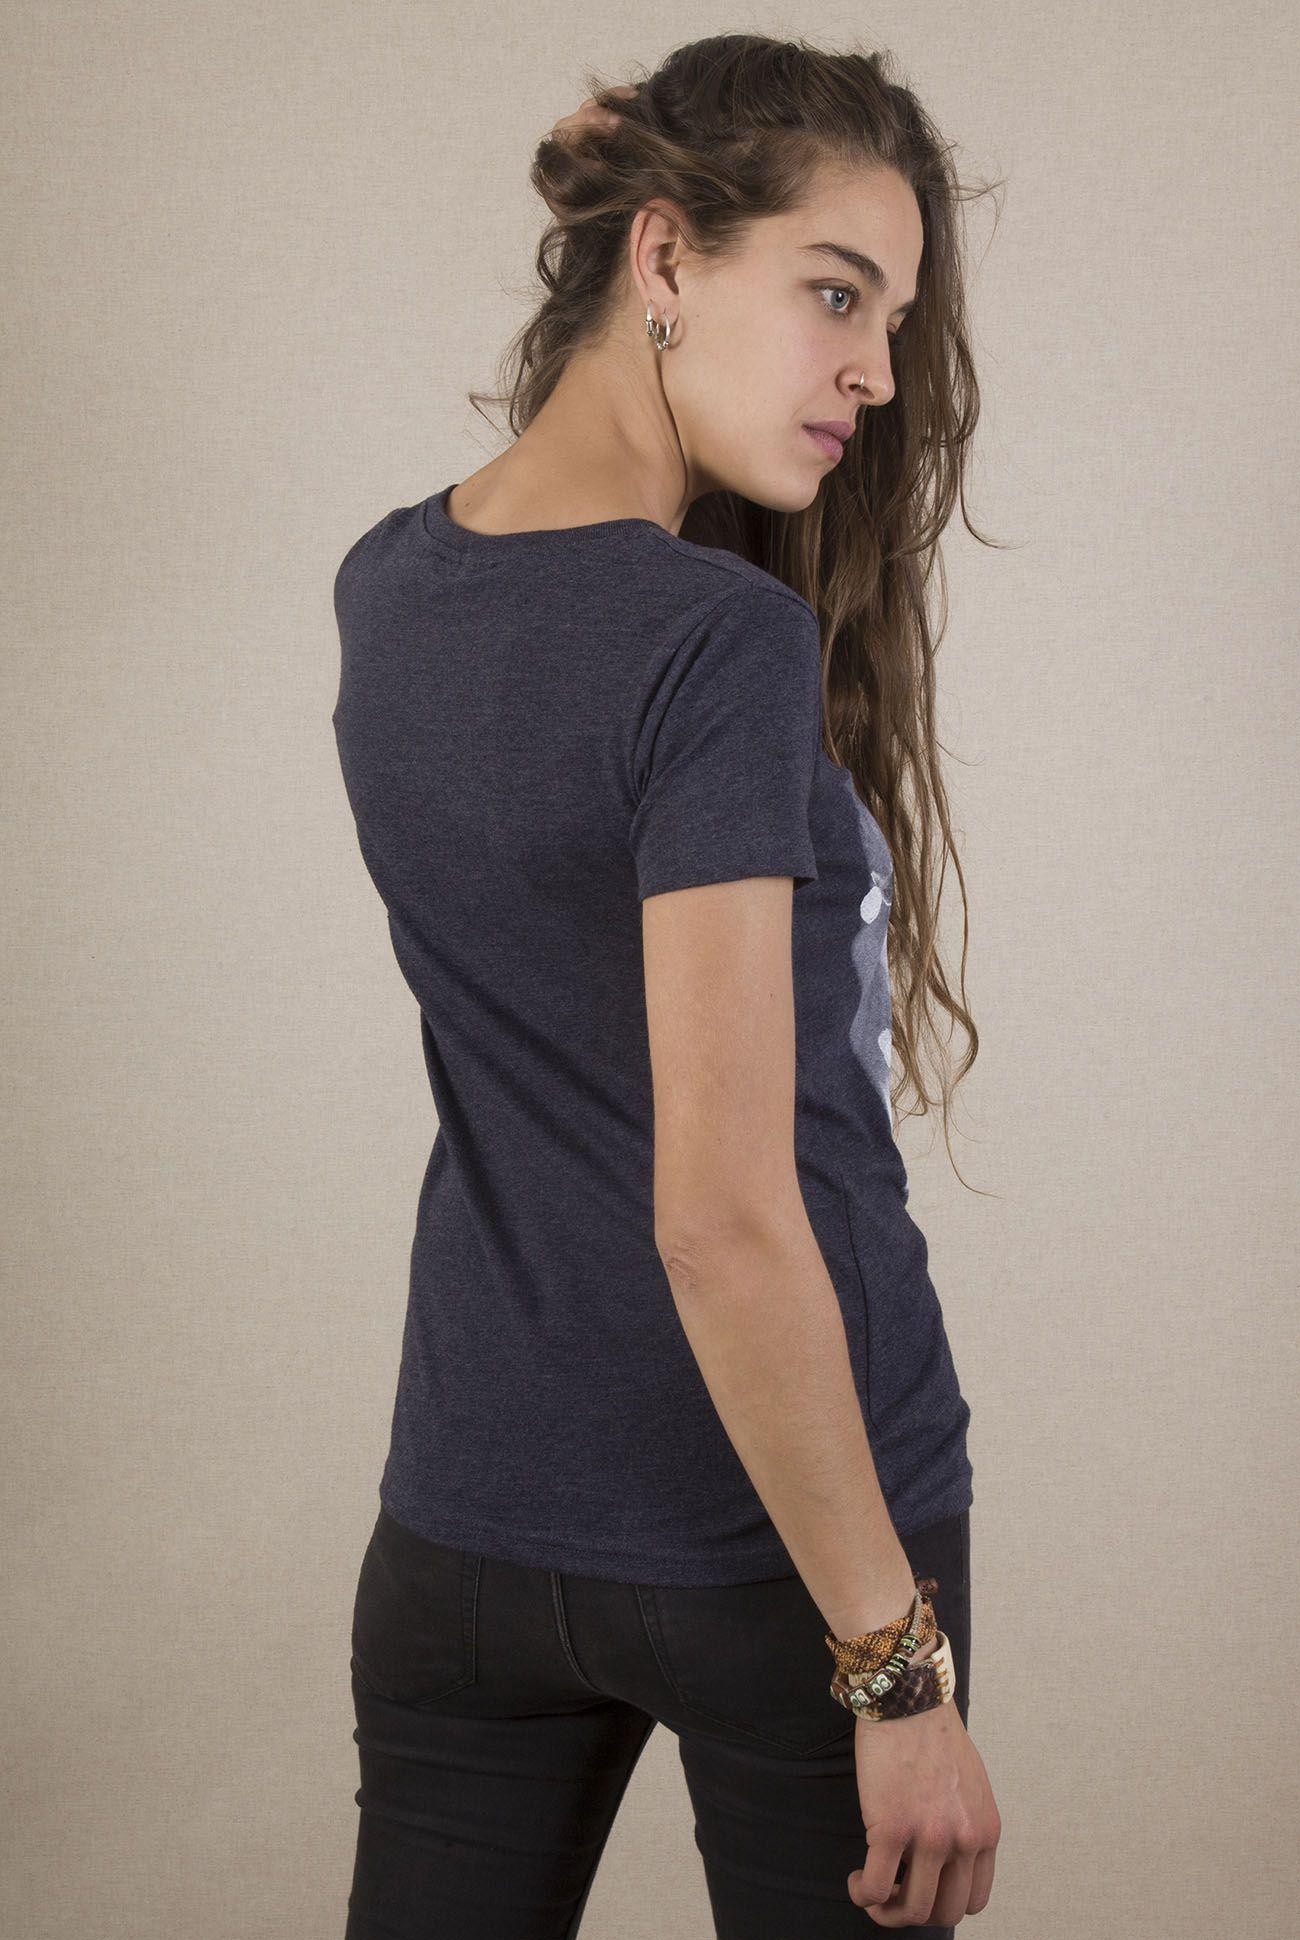 Camiseta Ballena Mujer